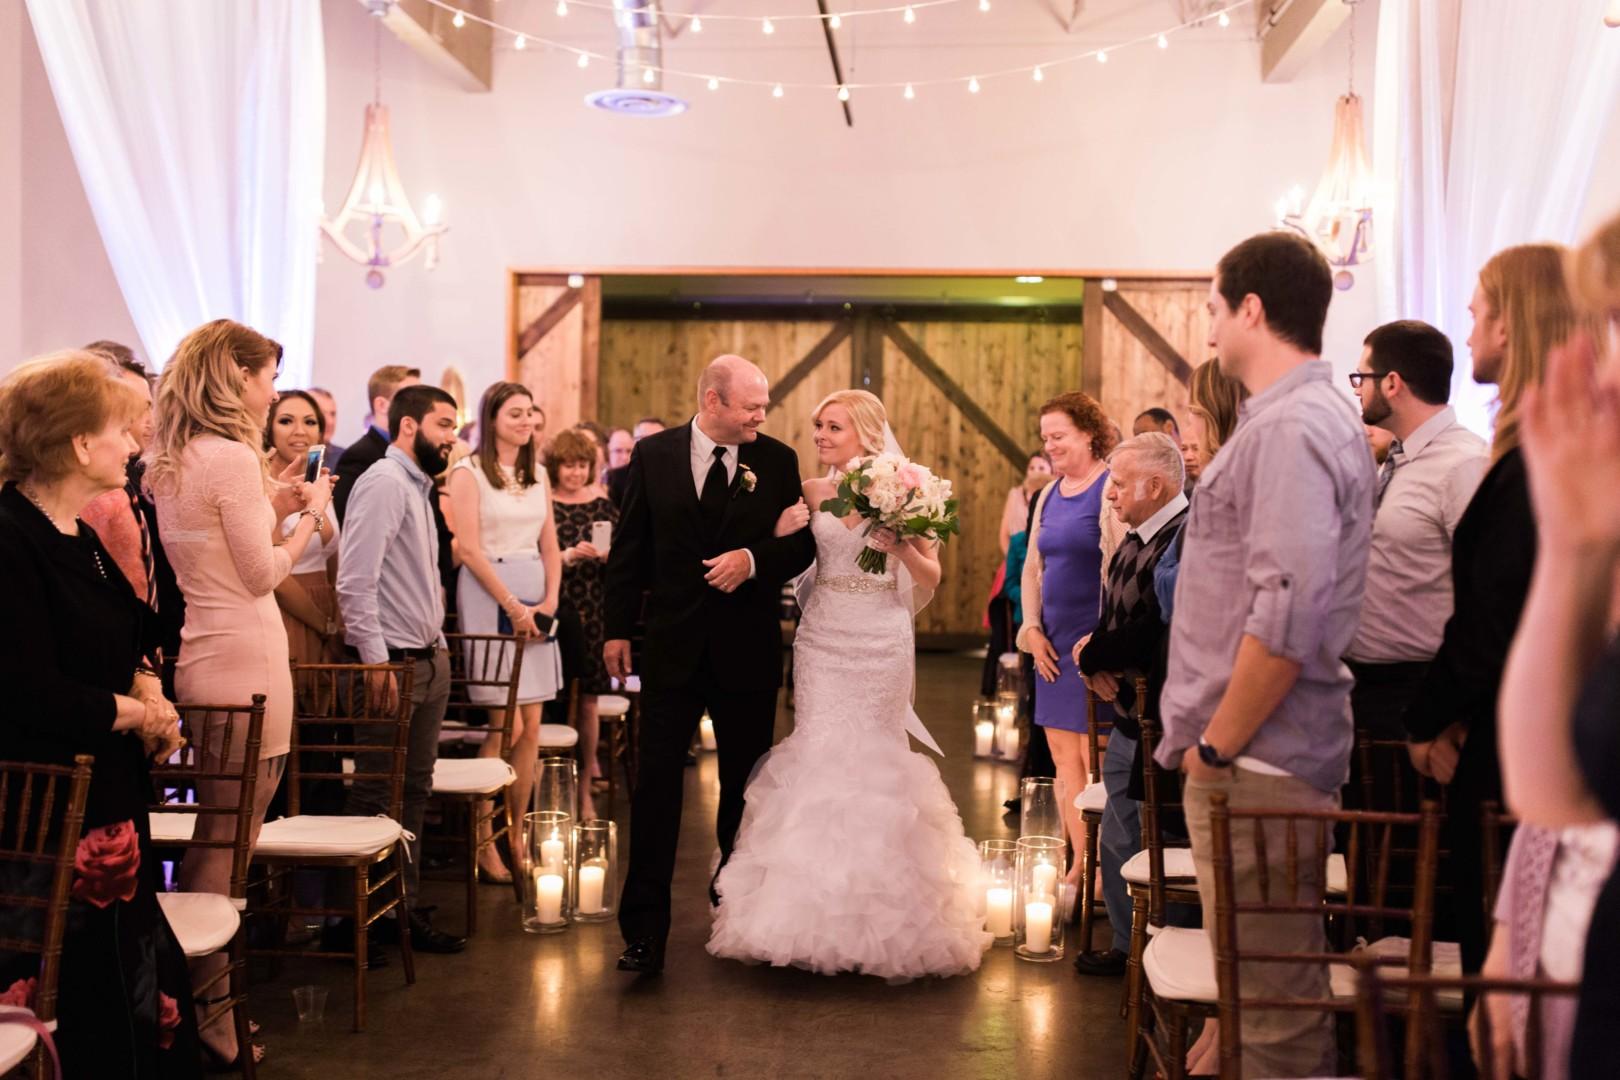 16-5-Looch-Lauren-Worl-Seattle-Wedding-Photography-Nicole-Barkis-Photographer-The-Foundry-Herban-Feast-Ceremony-75